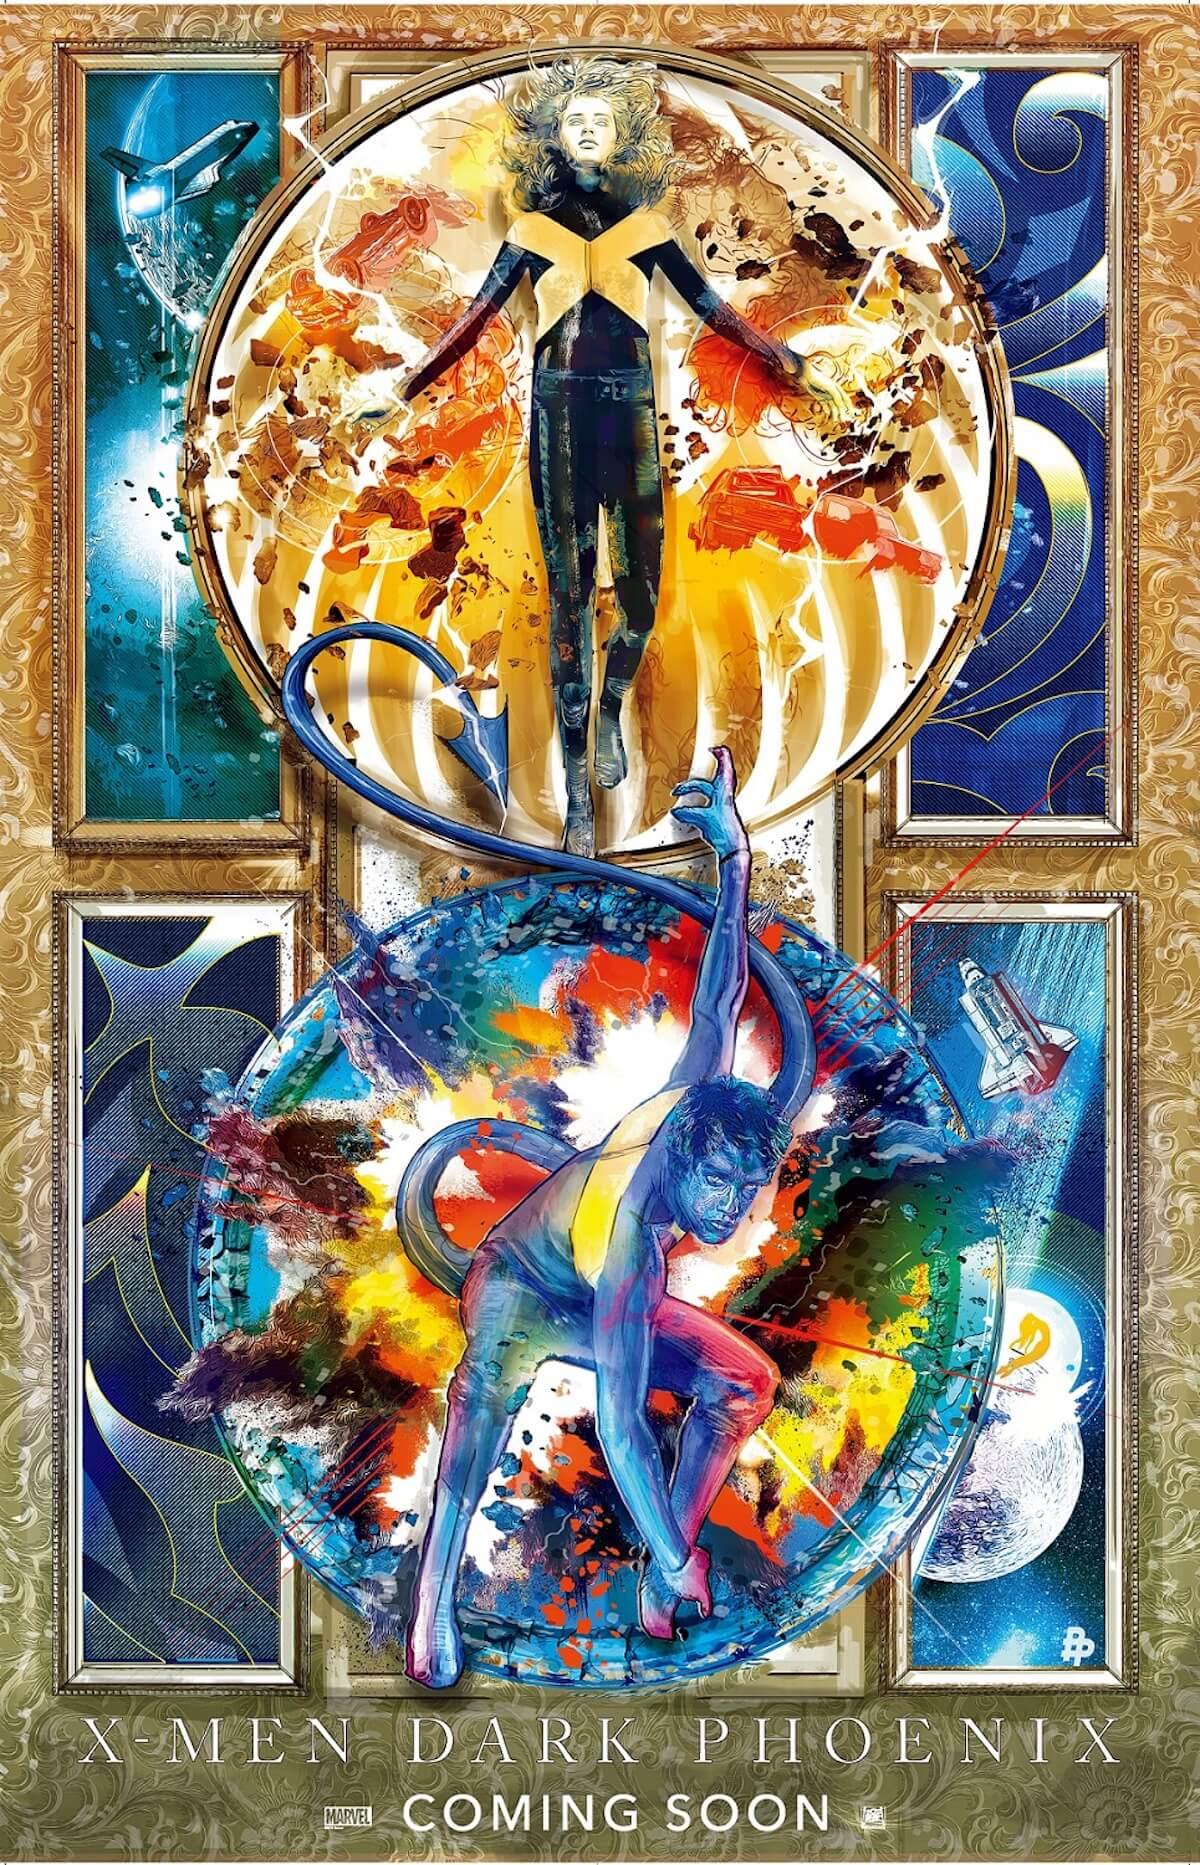 『X-MEN:ダーク・フェニックス』公開記念イベント<XーMEN DAY>が開催!ジーン役ソフィー・ターナーの特別映像解禁 film190517_xmenday_9